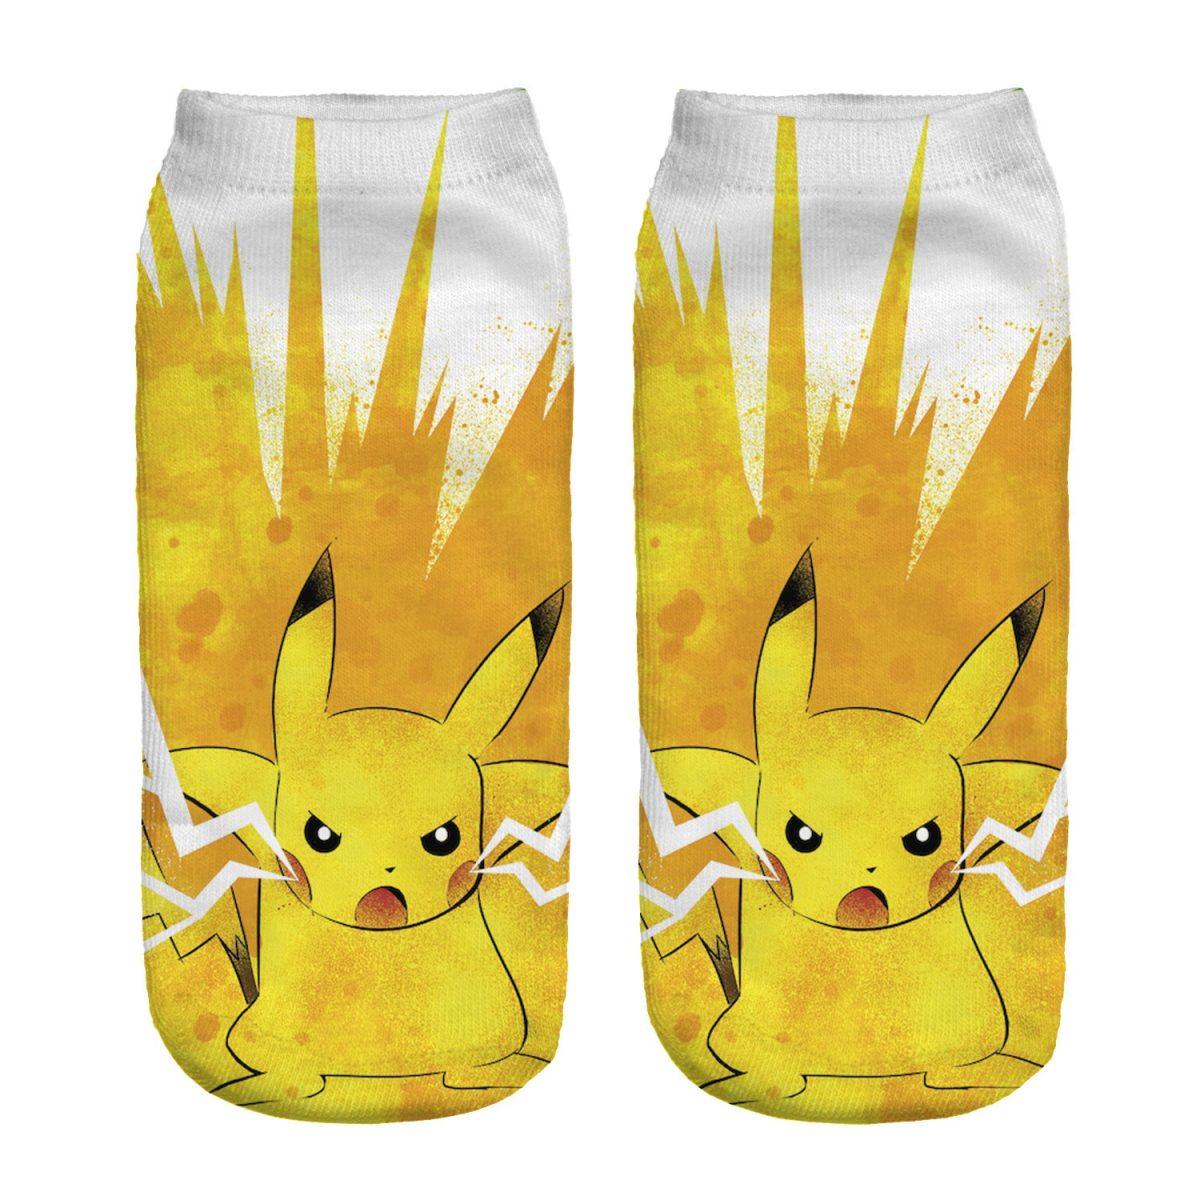 Pokemon Harajuku 3D Printed Socks